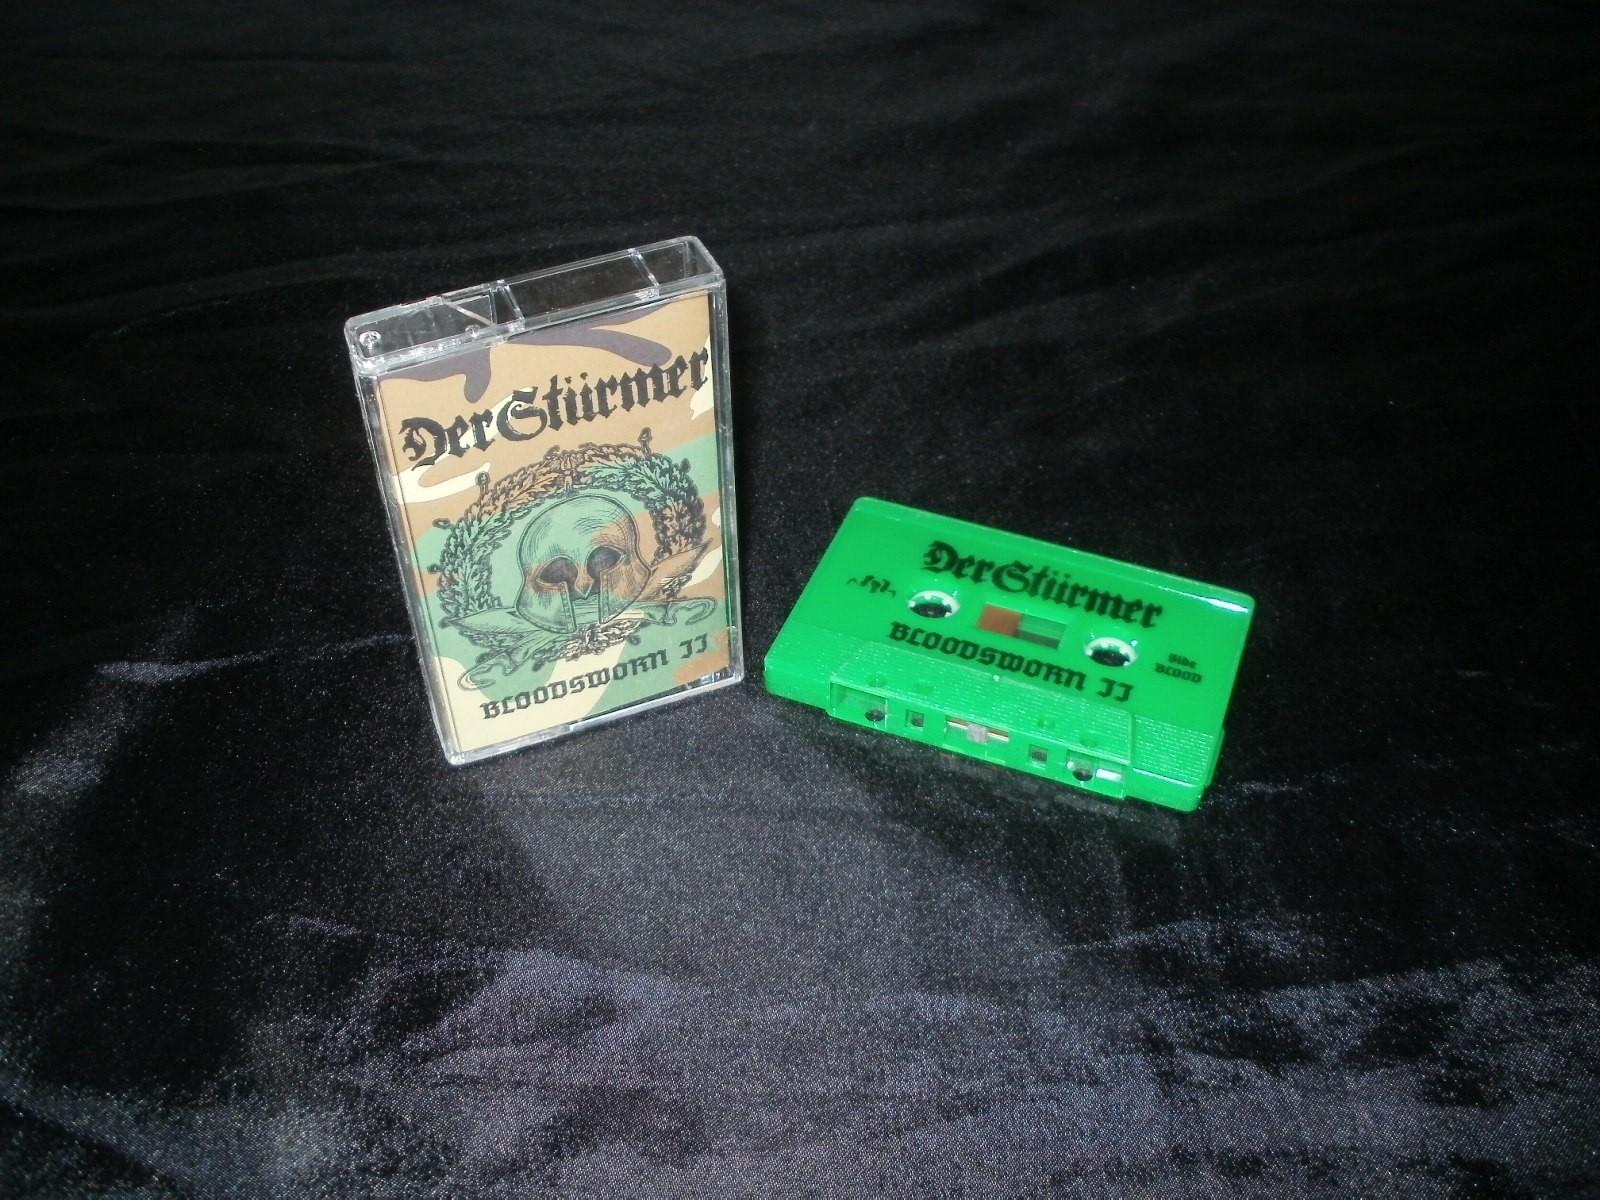 DER STÜRMER - Bloodsworn Part.2 Pro - Tape